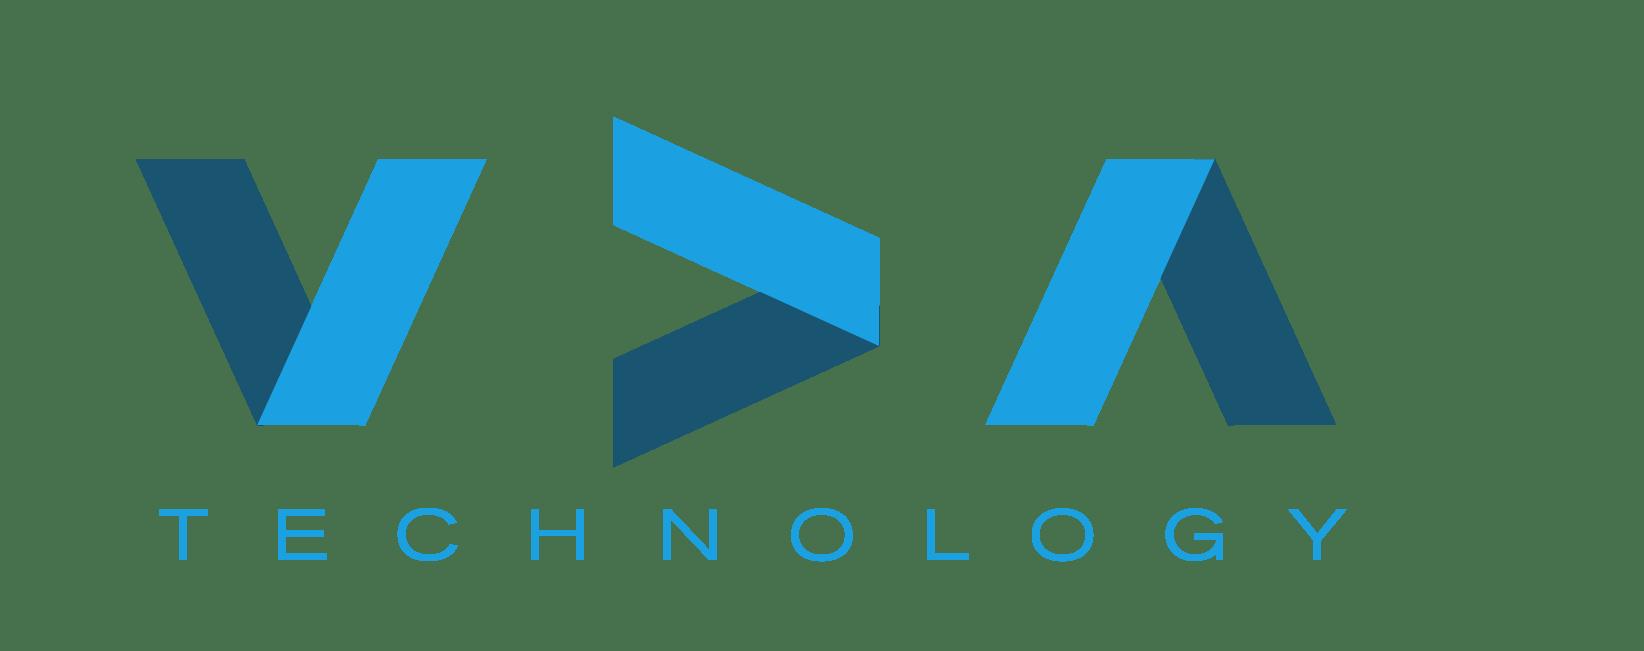 VDA Technology